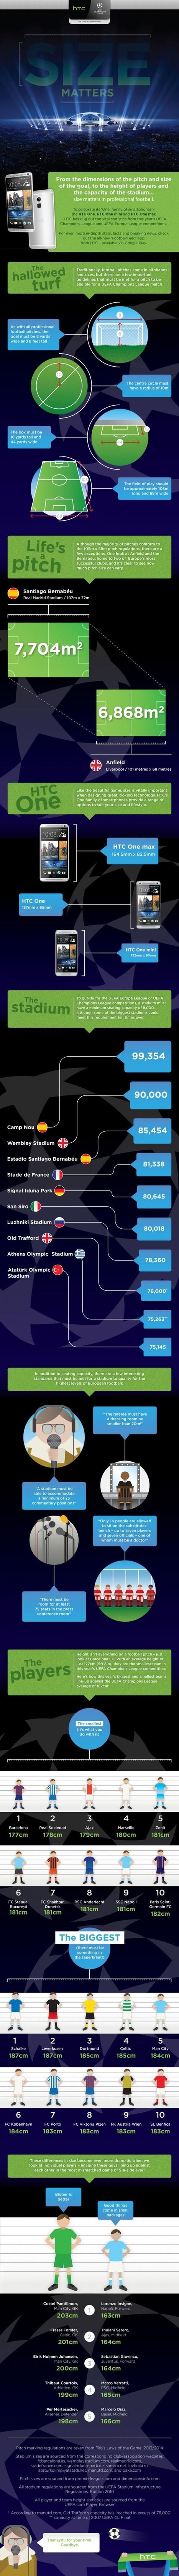 @htc >>> @UEFAcom Tech Talk: Size Matters | #Technology | Scoop.it